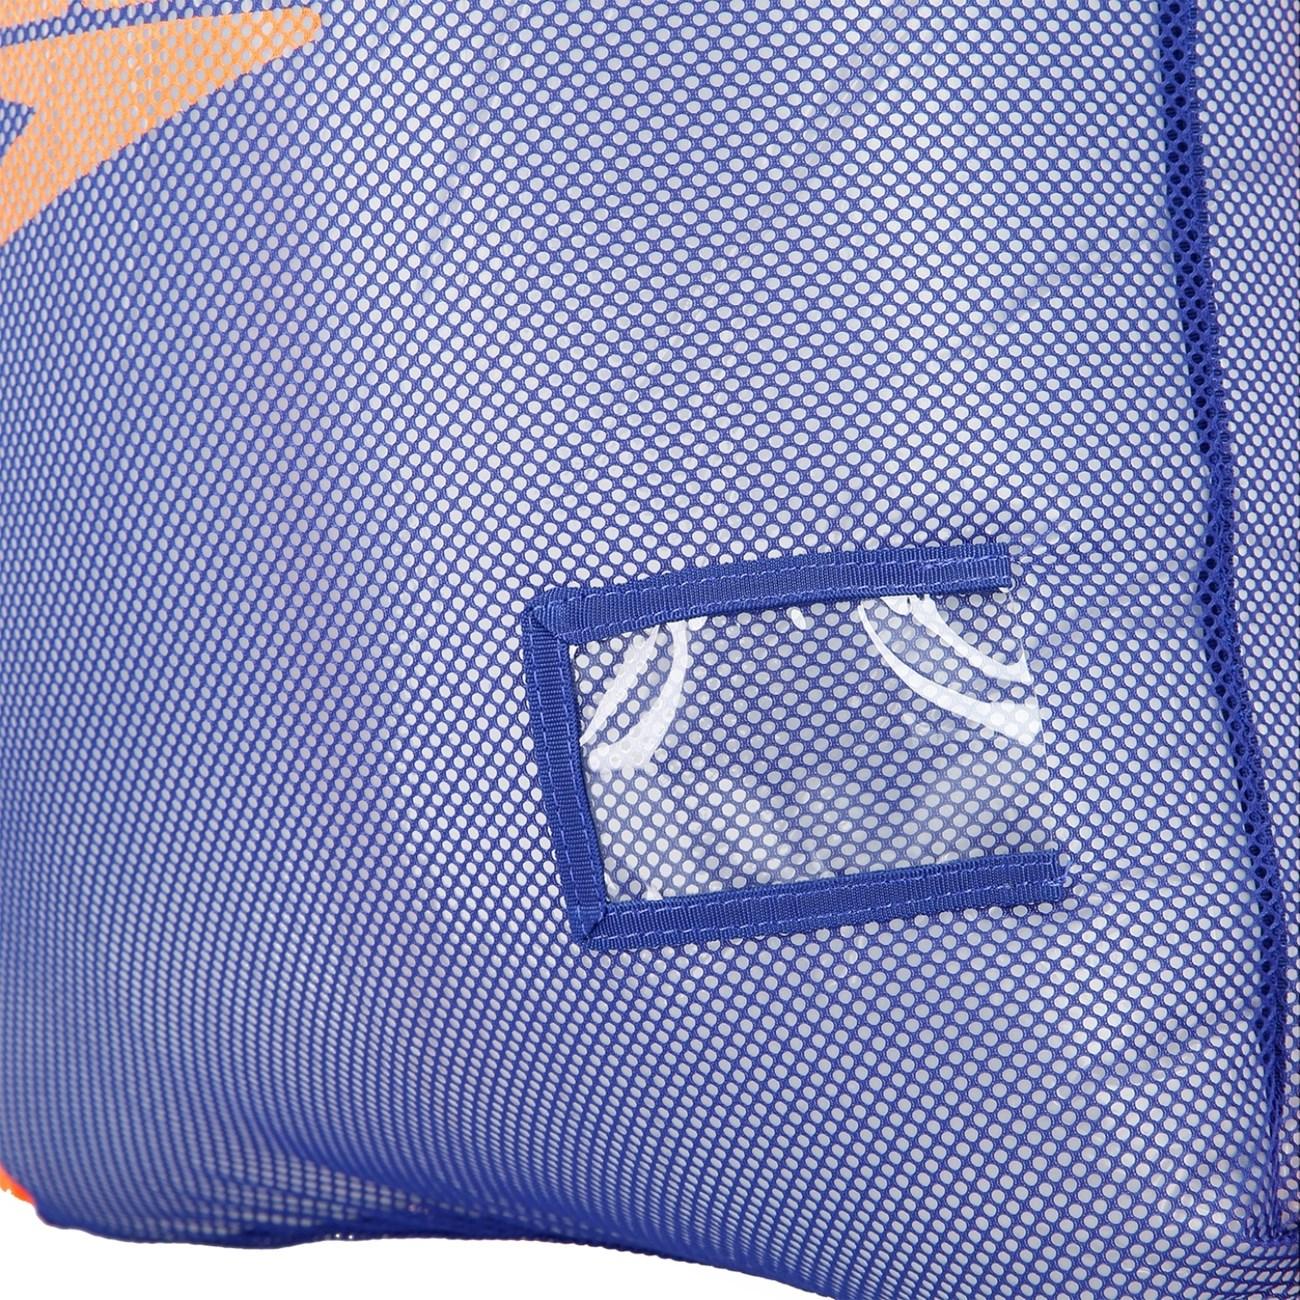 SPEEDO Equipment Mesh Bag   Τσάντες και Σακίδια Κολύμβησης  bd2362dc2b5cc